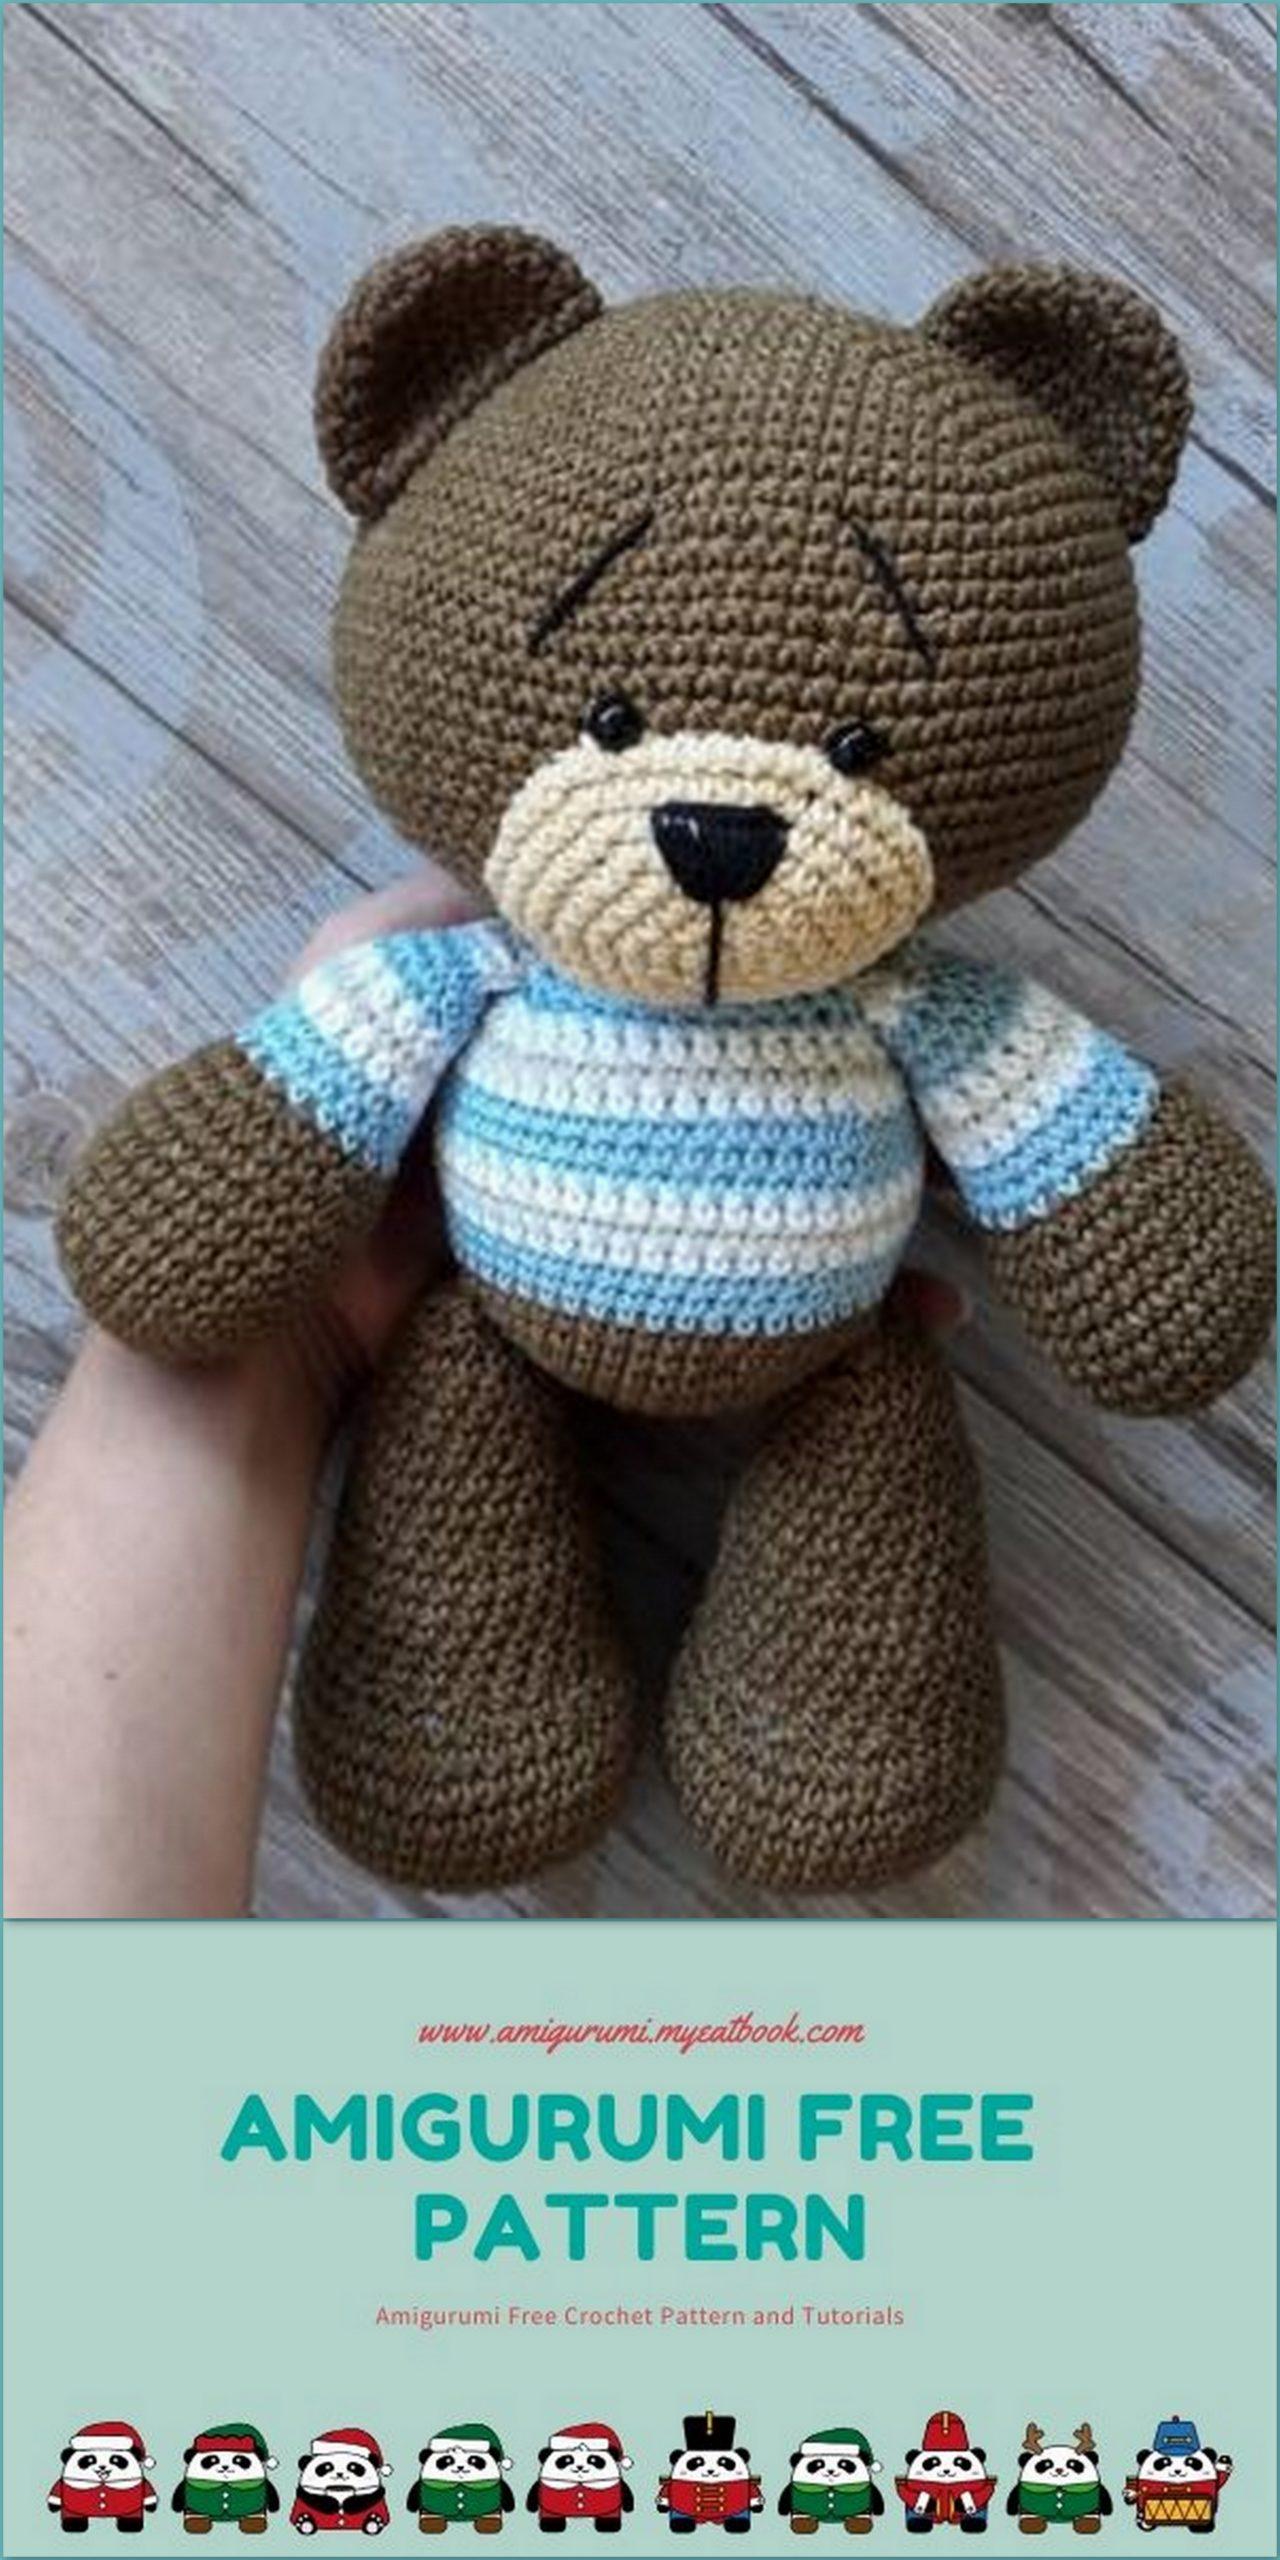 Happyamigurumi: Amigurumi Jointed Teddy Bear Villem and Marta: New ... | 2560x1280